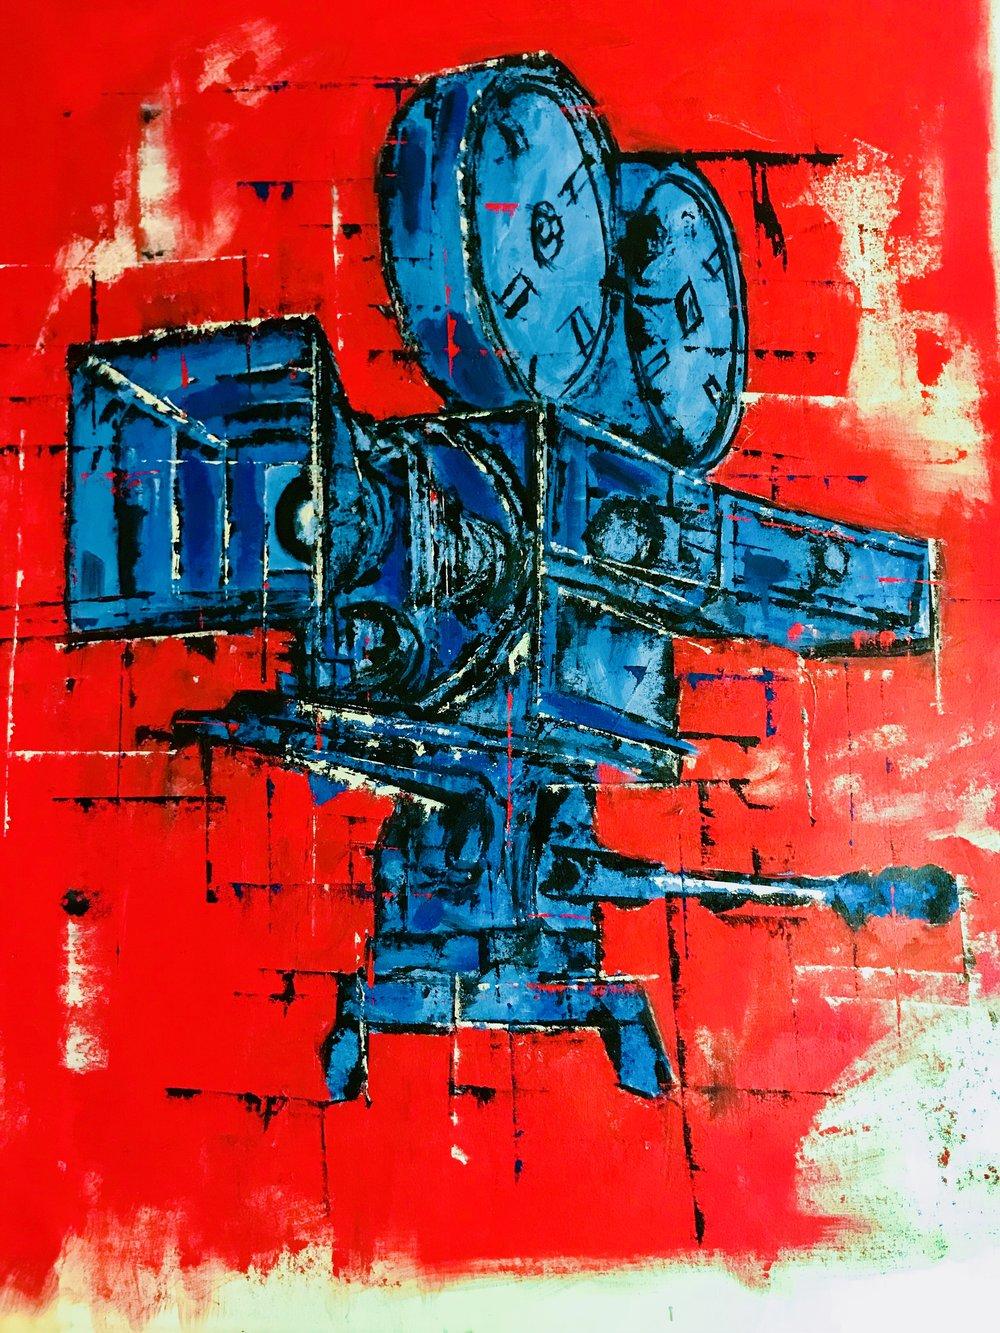 'Hollywood On Fire' - 40X50|Oil On Canvas|